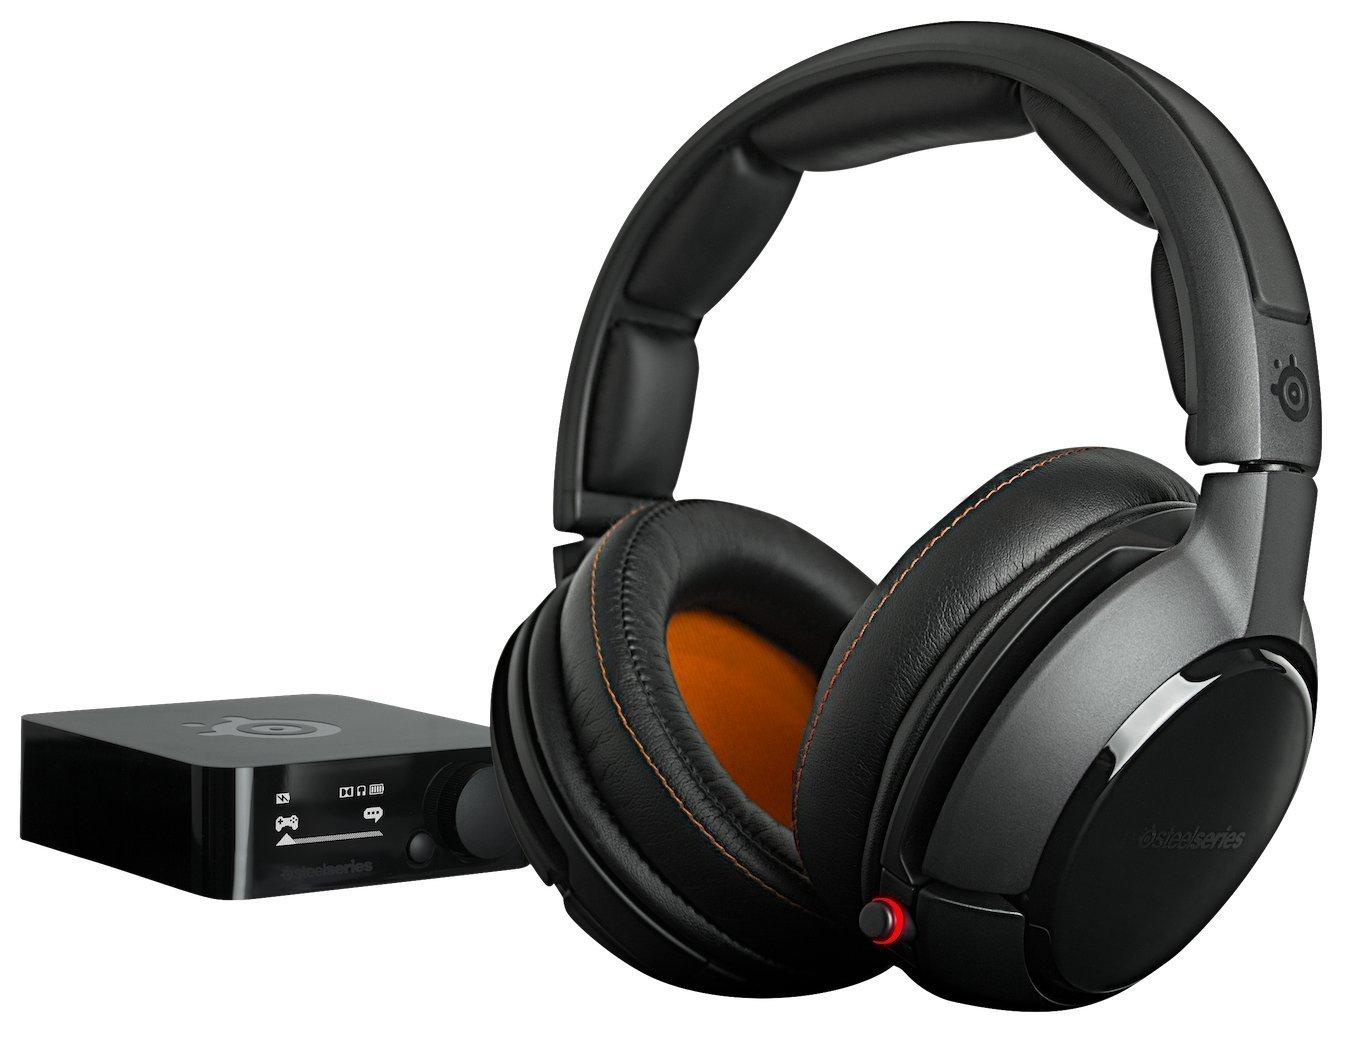 [Comtech/Comdeal] SteelSeries Siberia 800, Gaming-Headset, Drahtlos, Dolby 7.1 Surround, PC / Mac / Playstation 4 / AppleTV / Roku / Mobilgerät für 159,-€ Versandkostenfrei